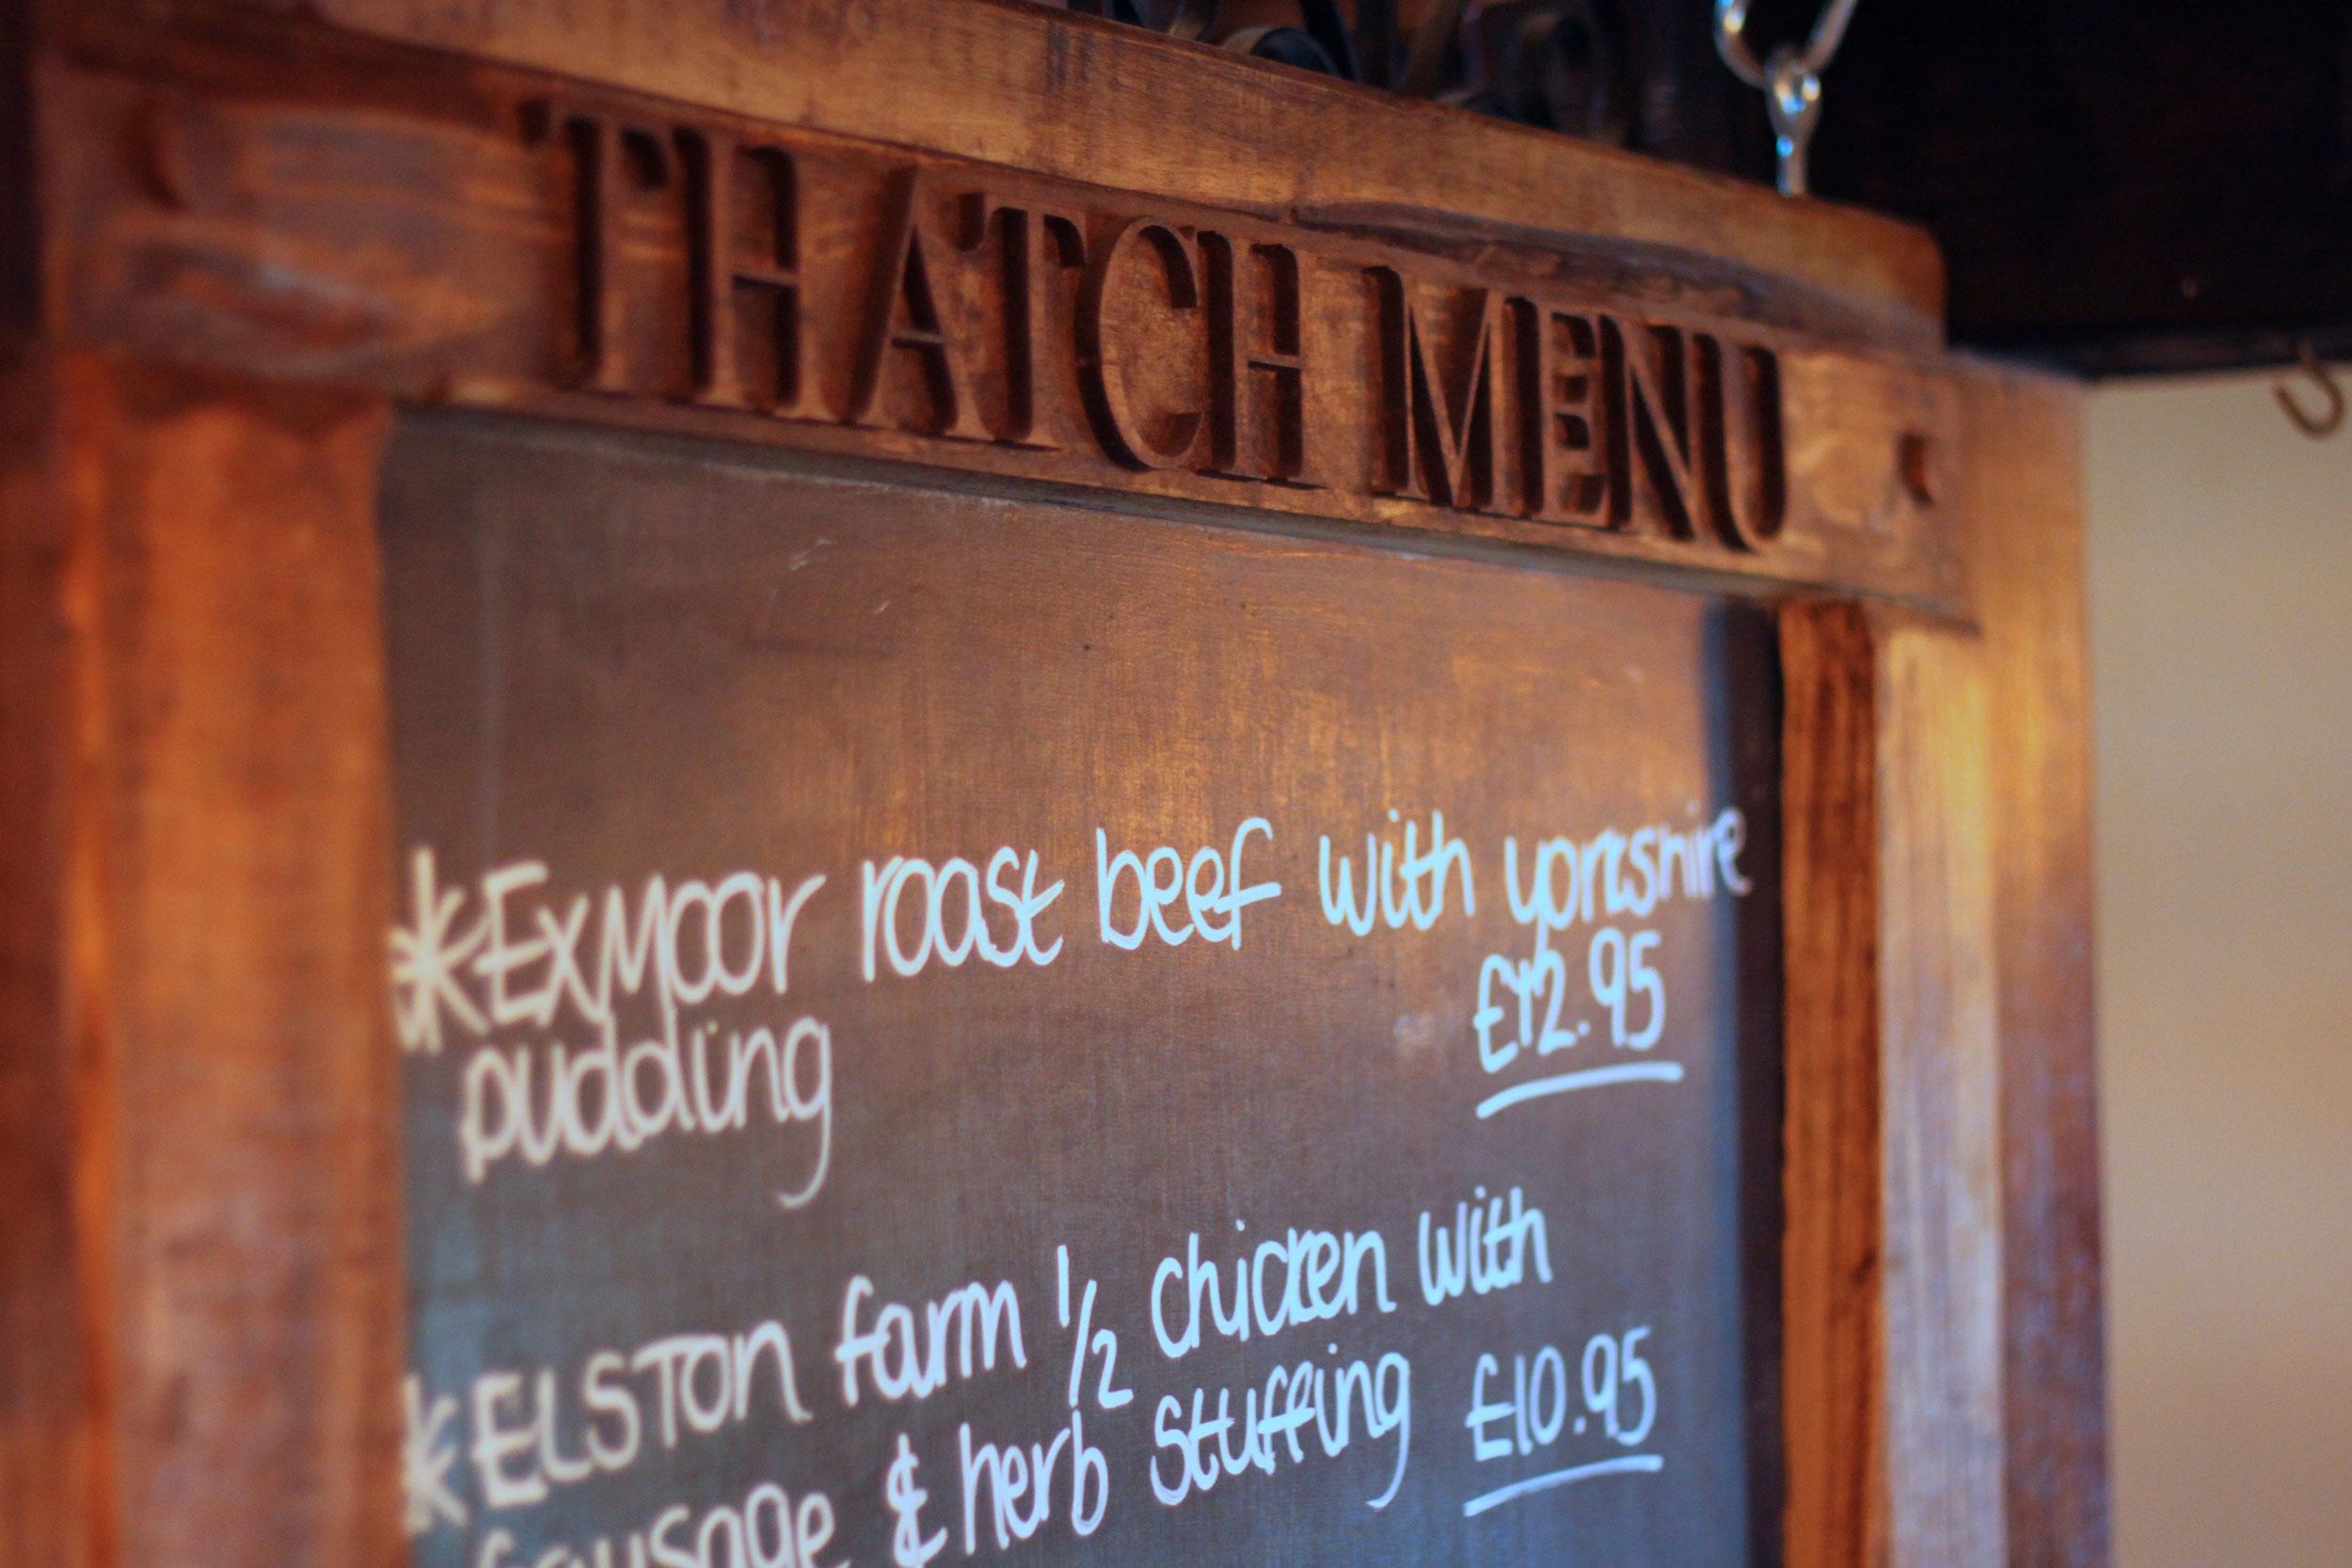 The-Thatched-Inn-Menu.jpg